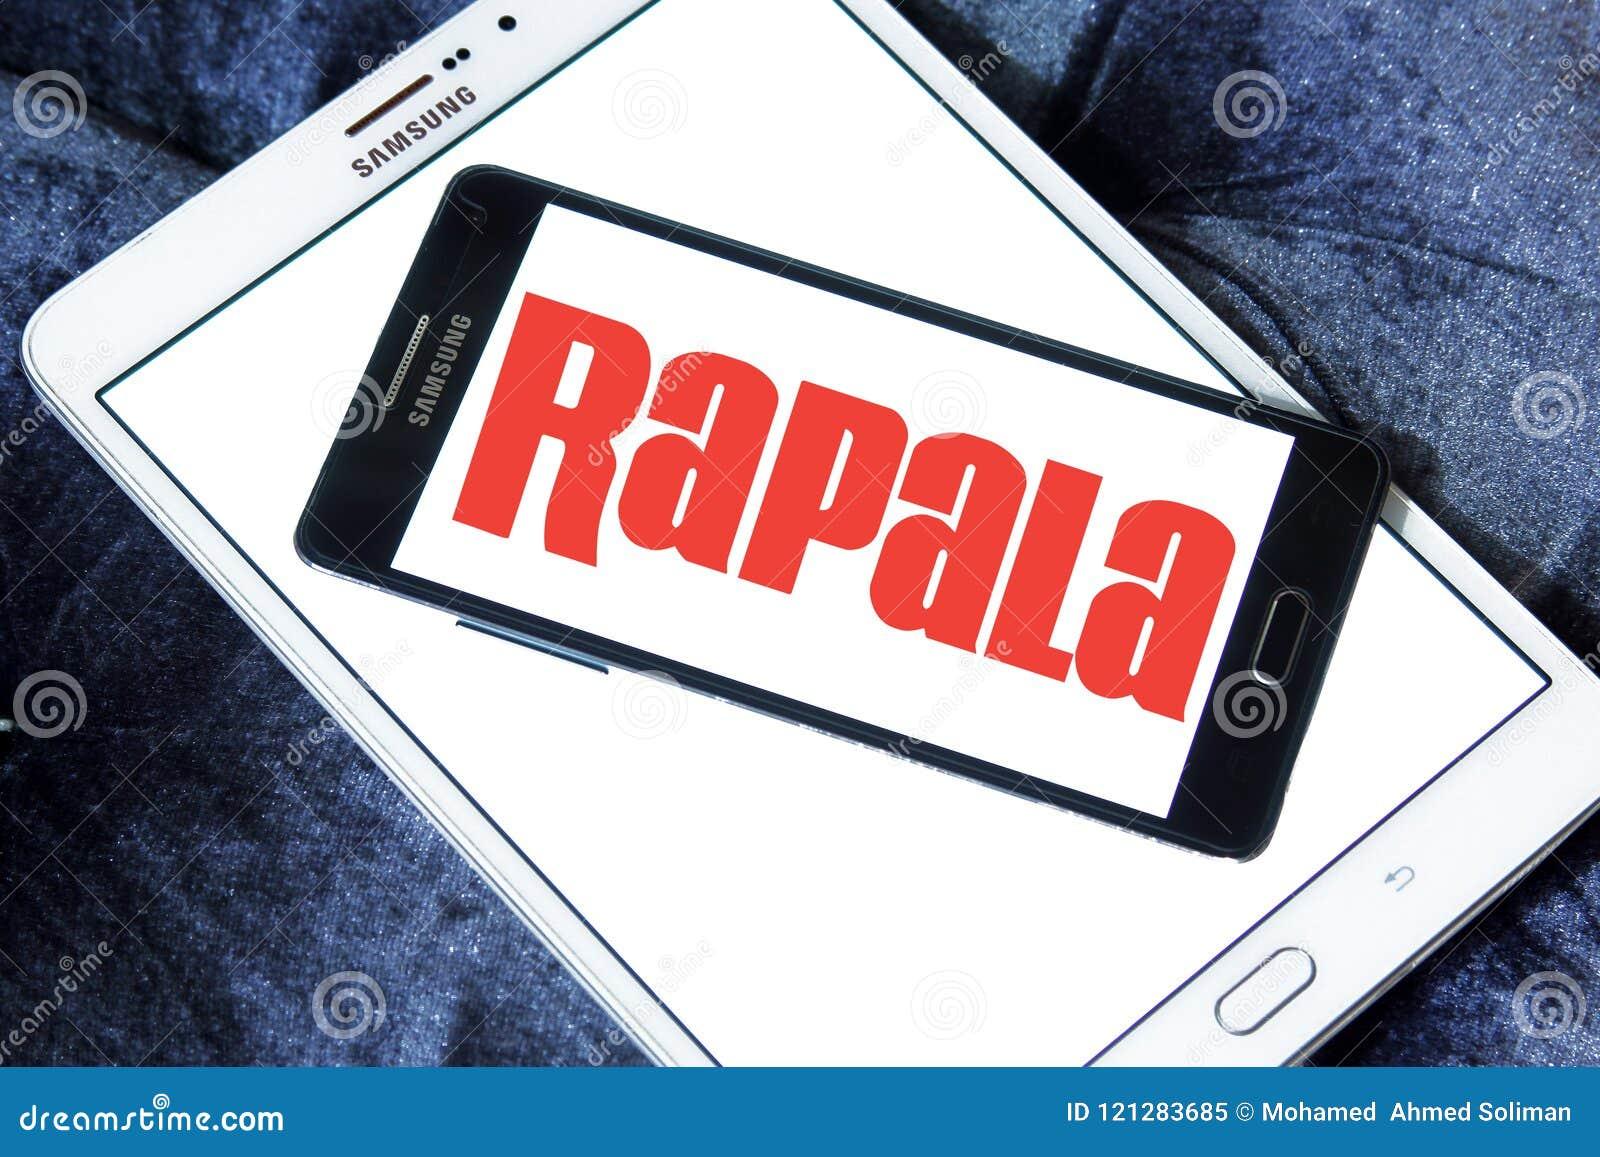 Rapala company logo editorial image  Image of icons - 121283685